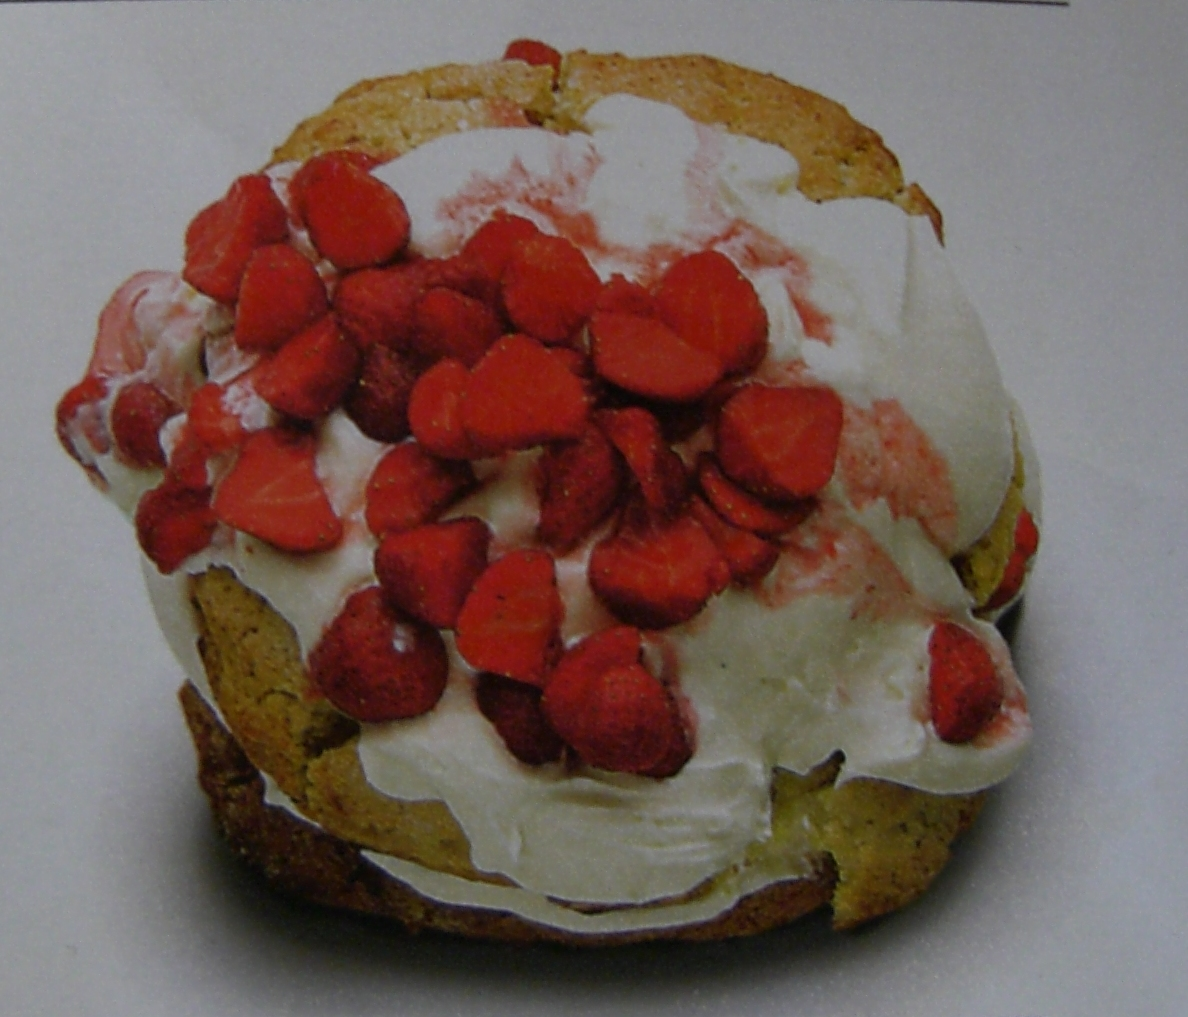 Clotted cream shortcake